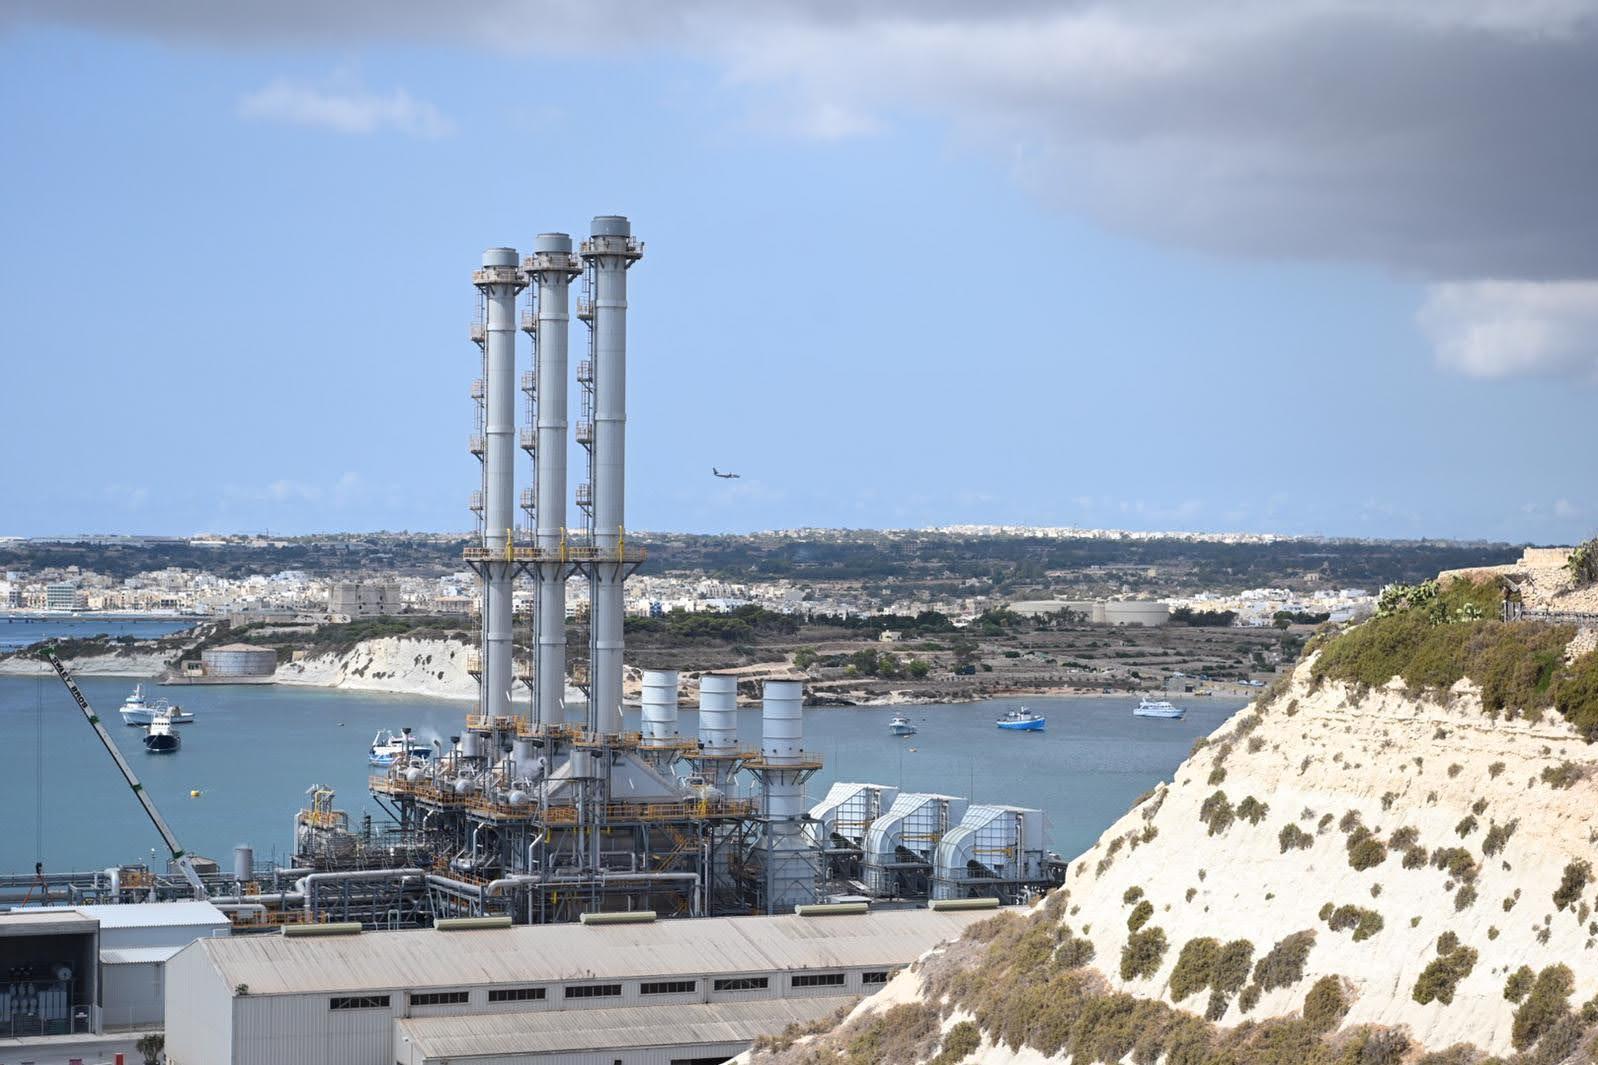 The Electrogas power station in Delimara. Photo: Mark Zammit Cordina